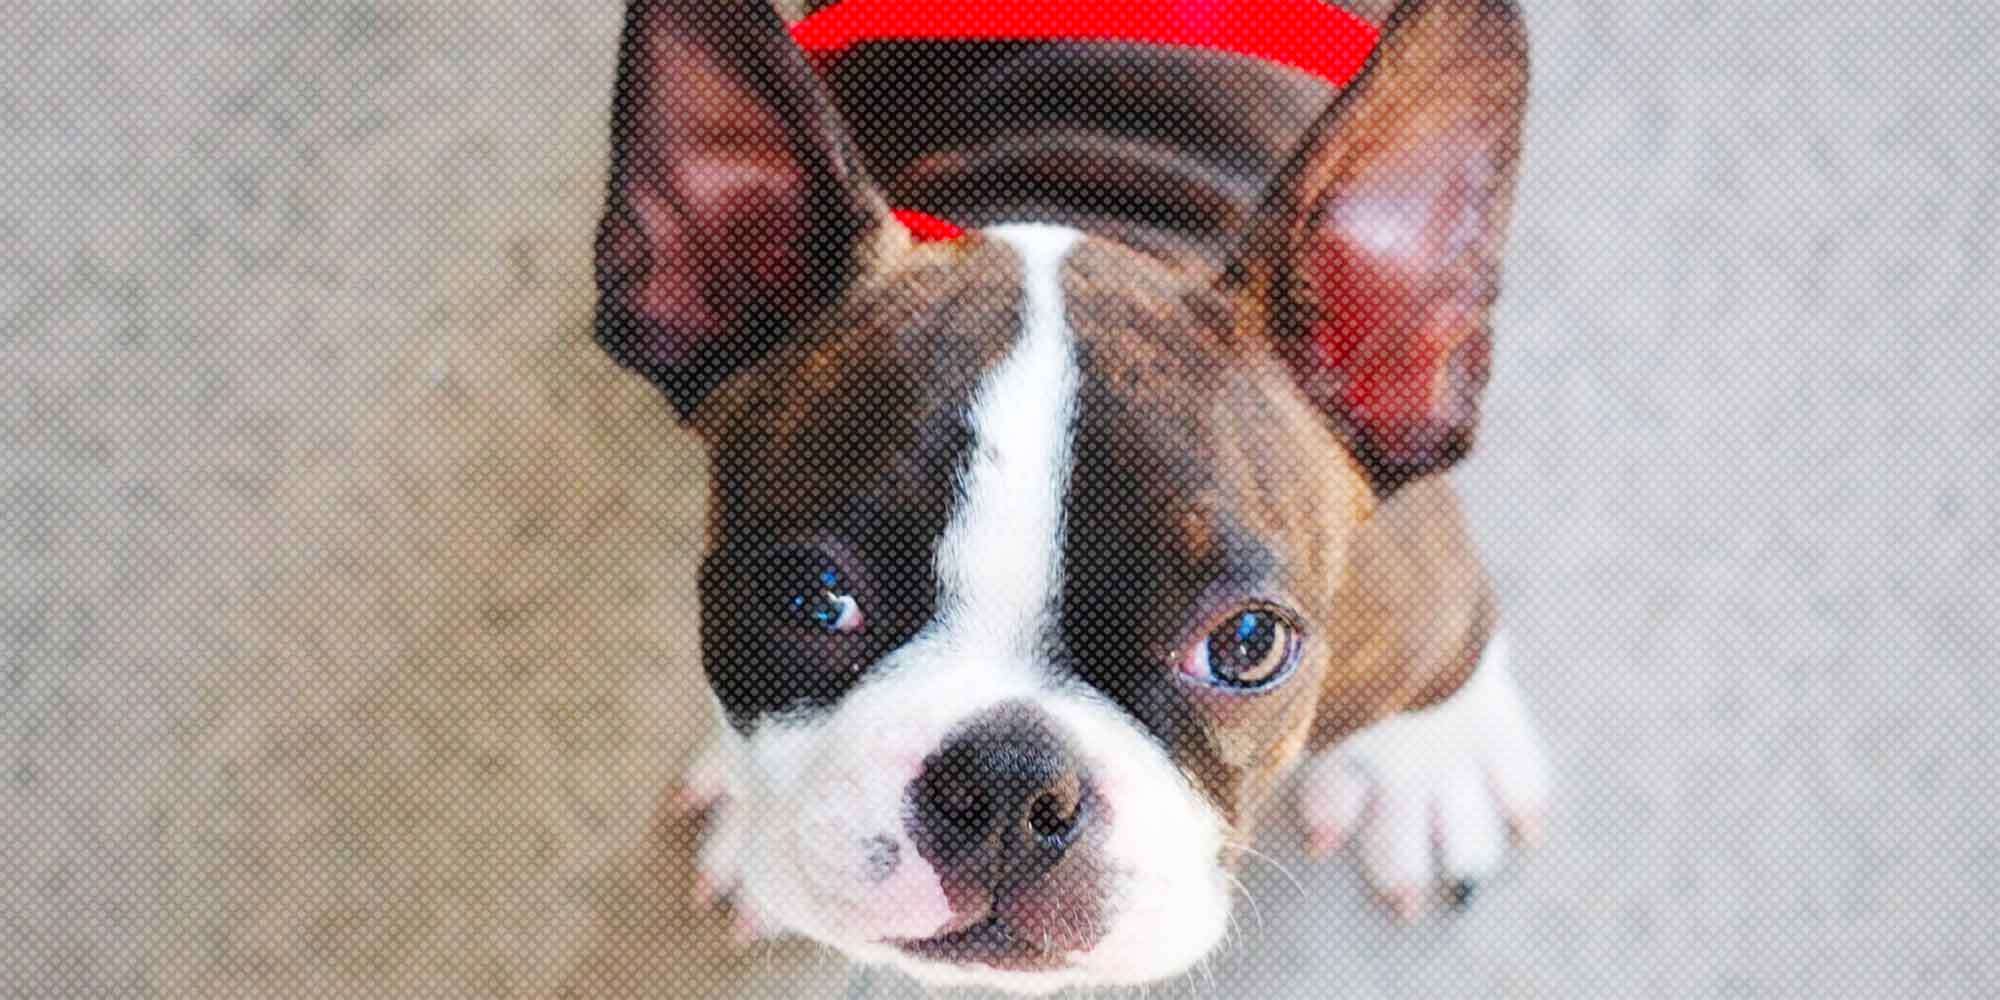 Boston Terrier Breed Information Profile Of The American Gentleman